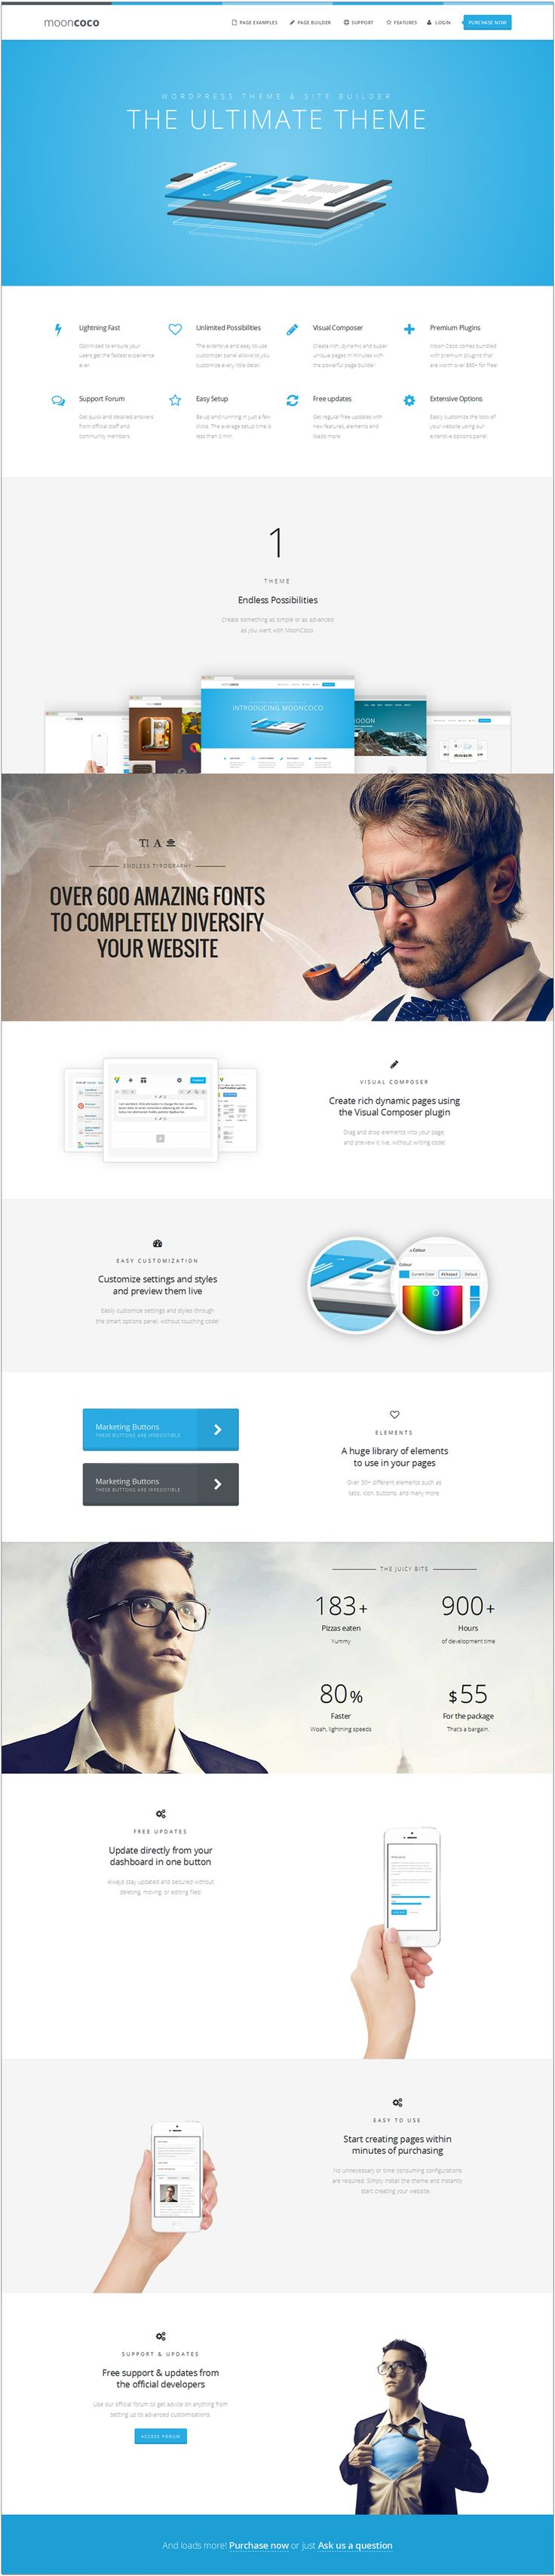 Daily Web Design And Development Inspirations No.404